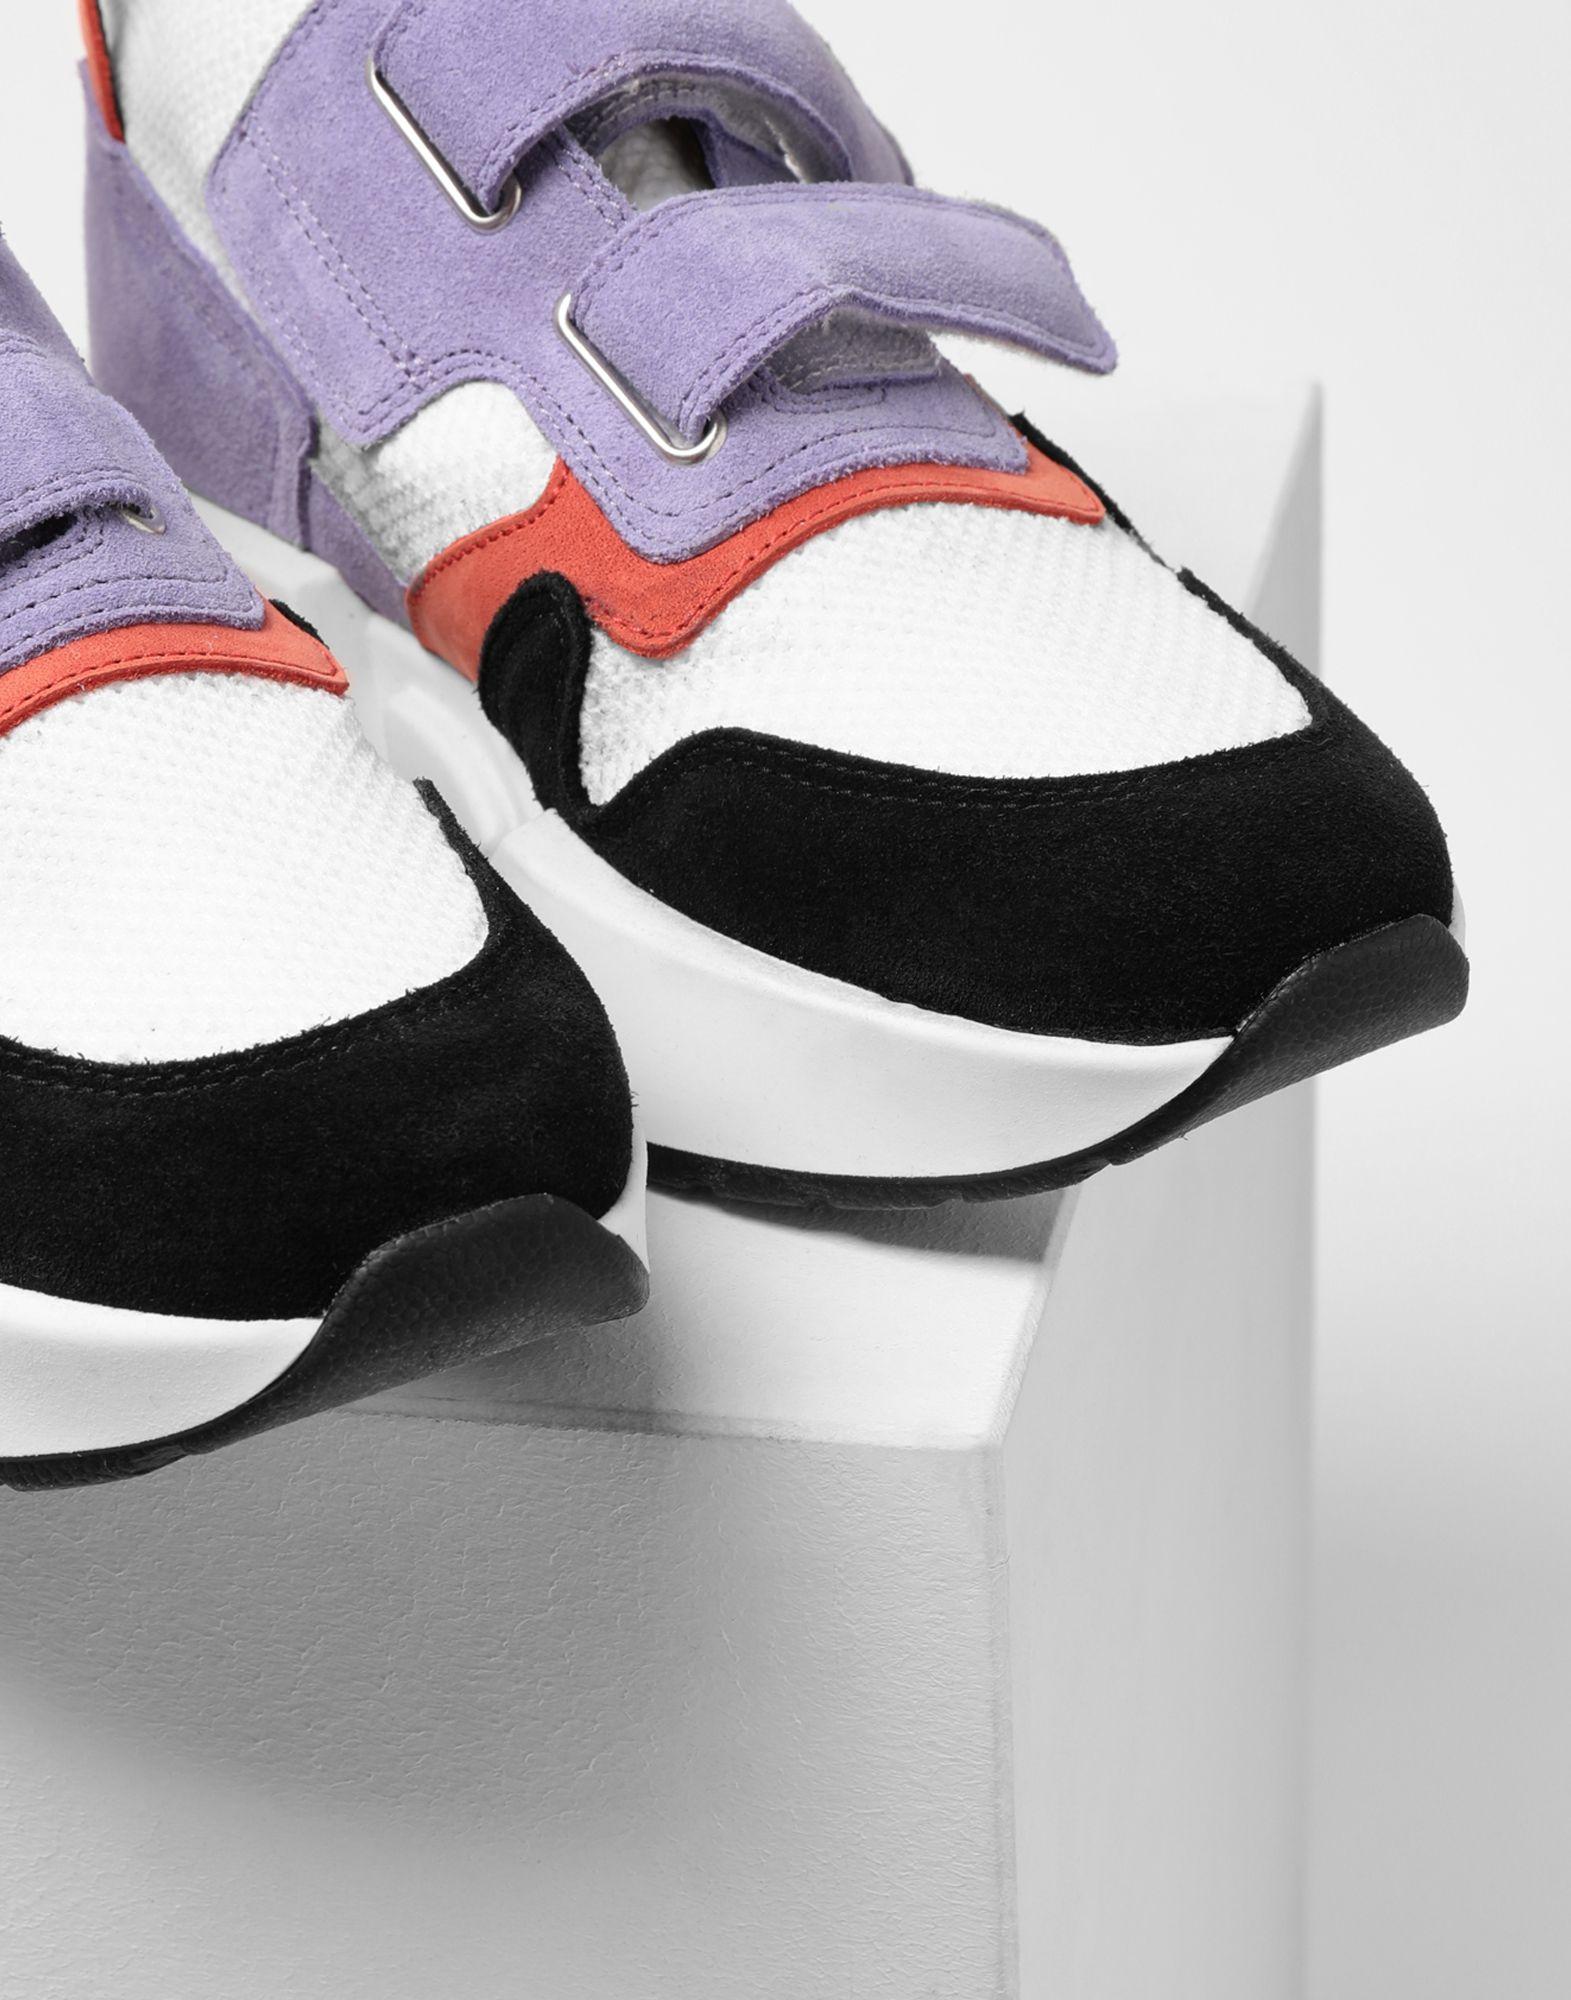 MM6 MAISON MARGIELA Sock runner leather sneakers Sneakers Woman e